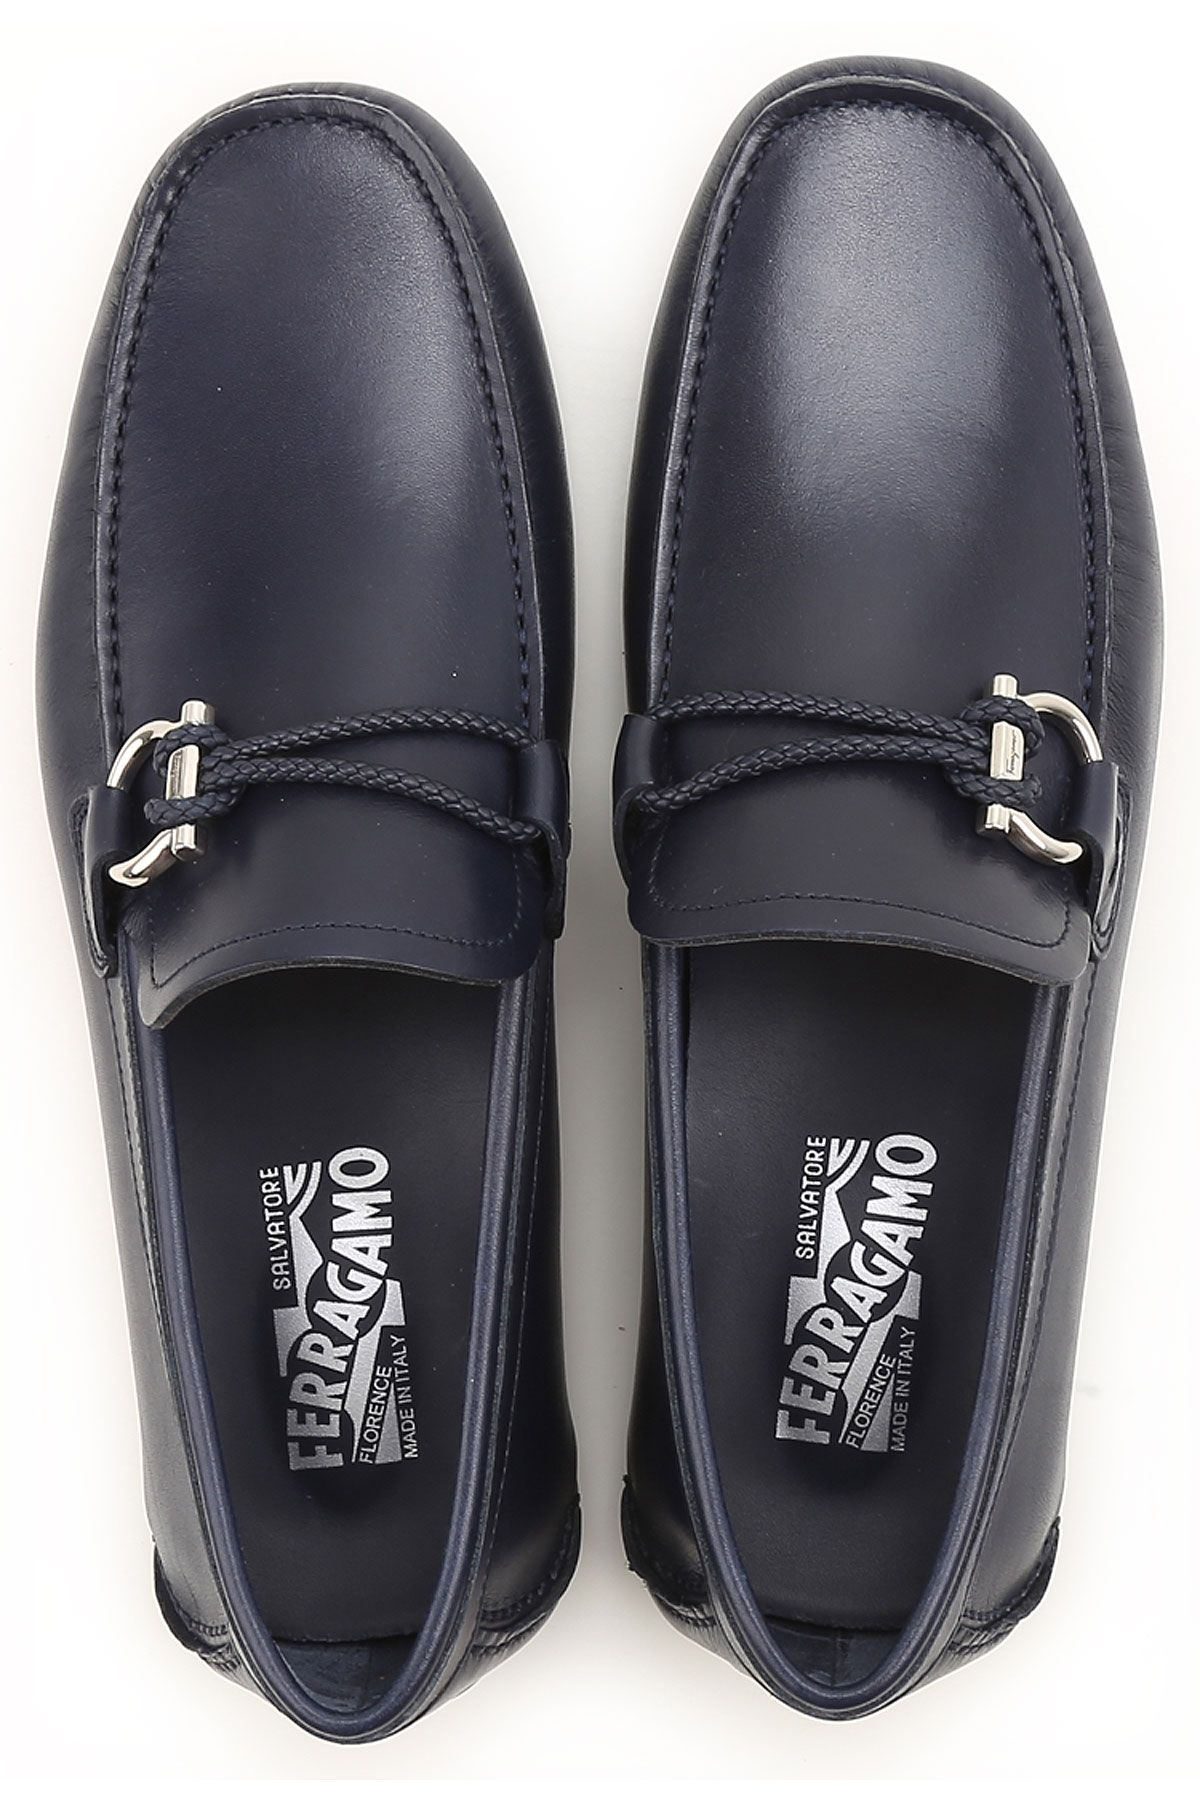 0ab0bba8de8 SALVATORE FERRAGAMO Shoes for Men